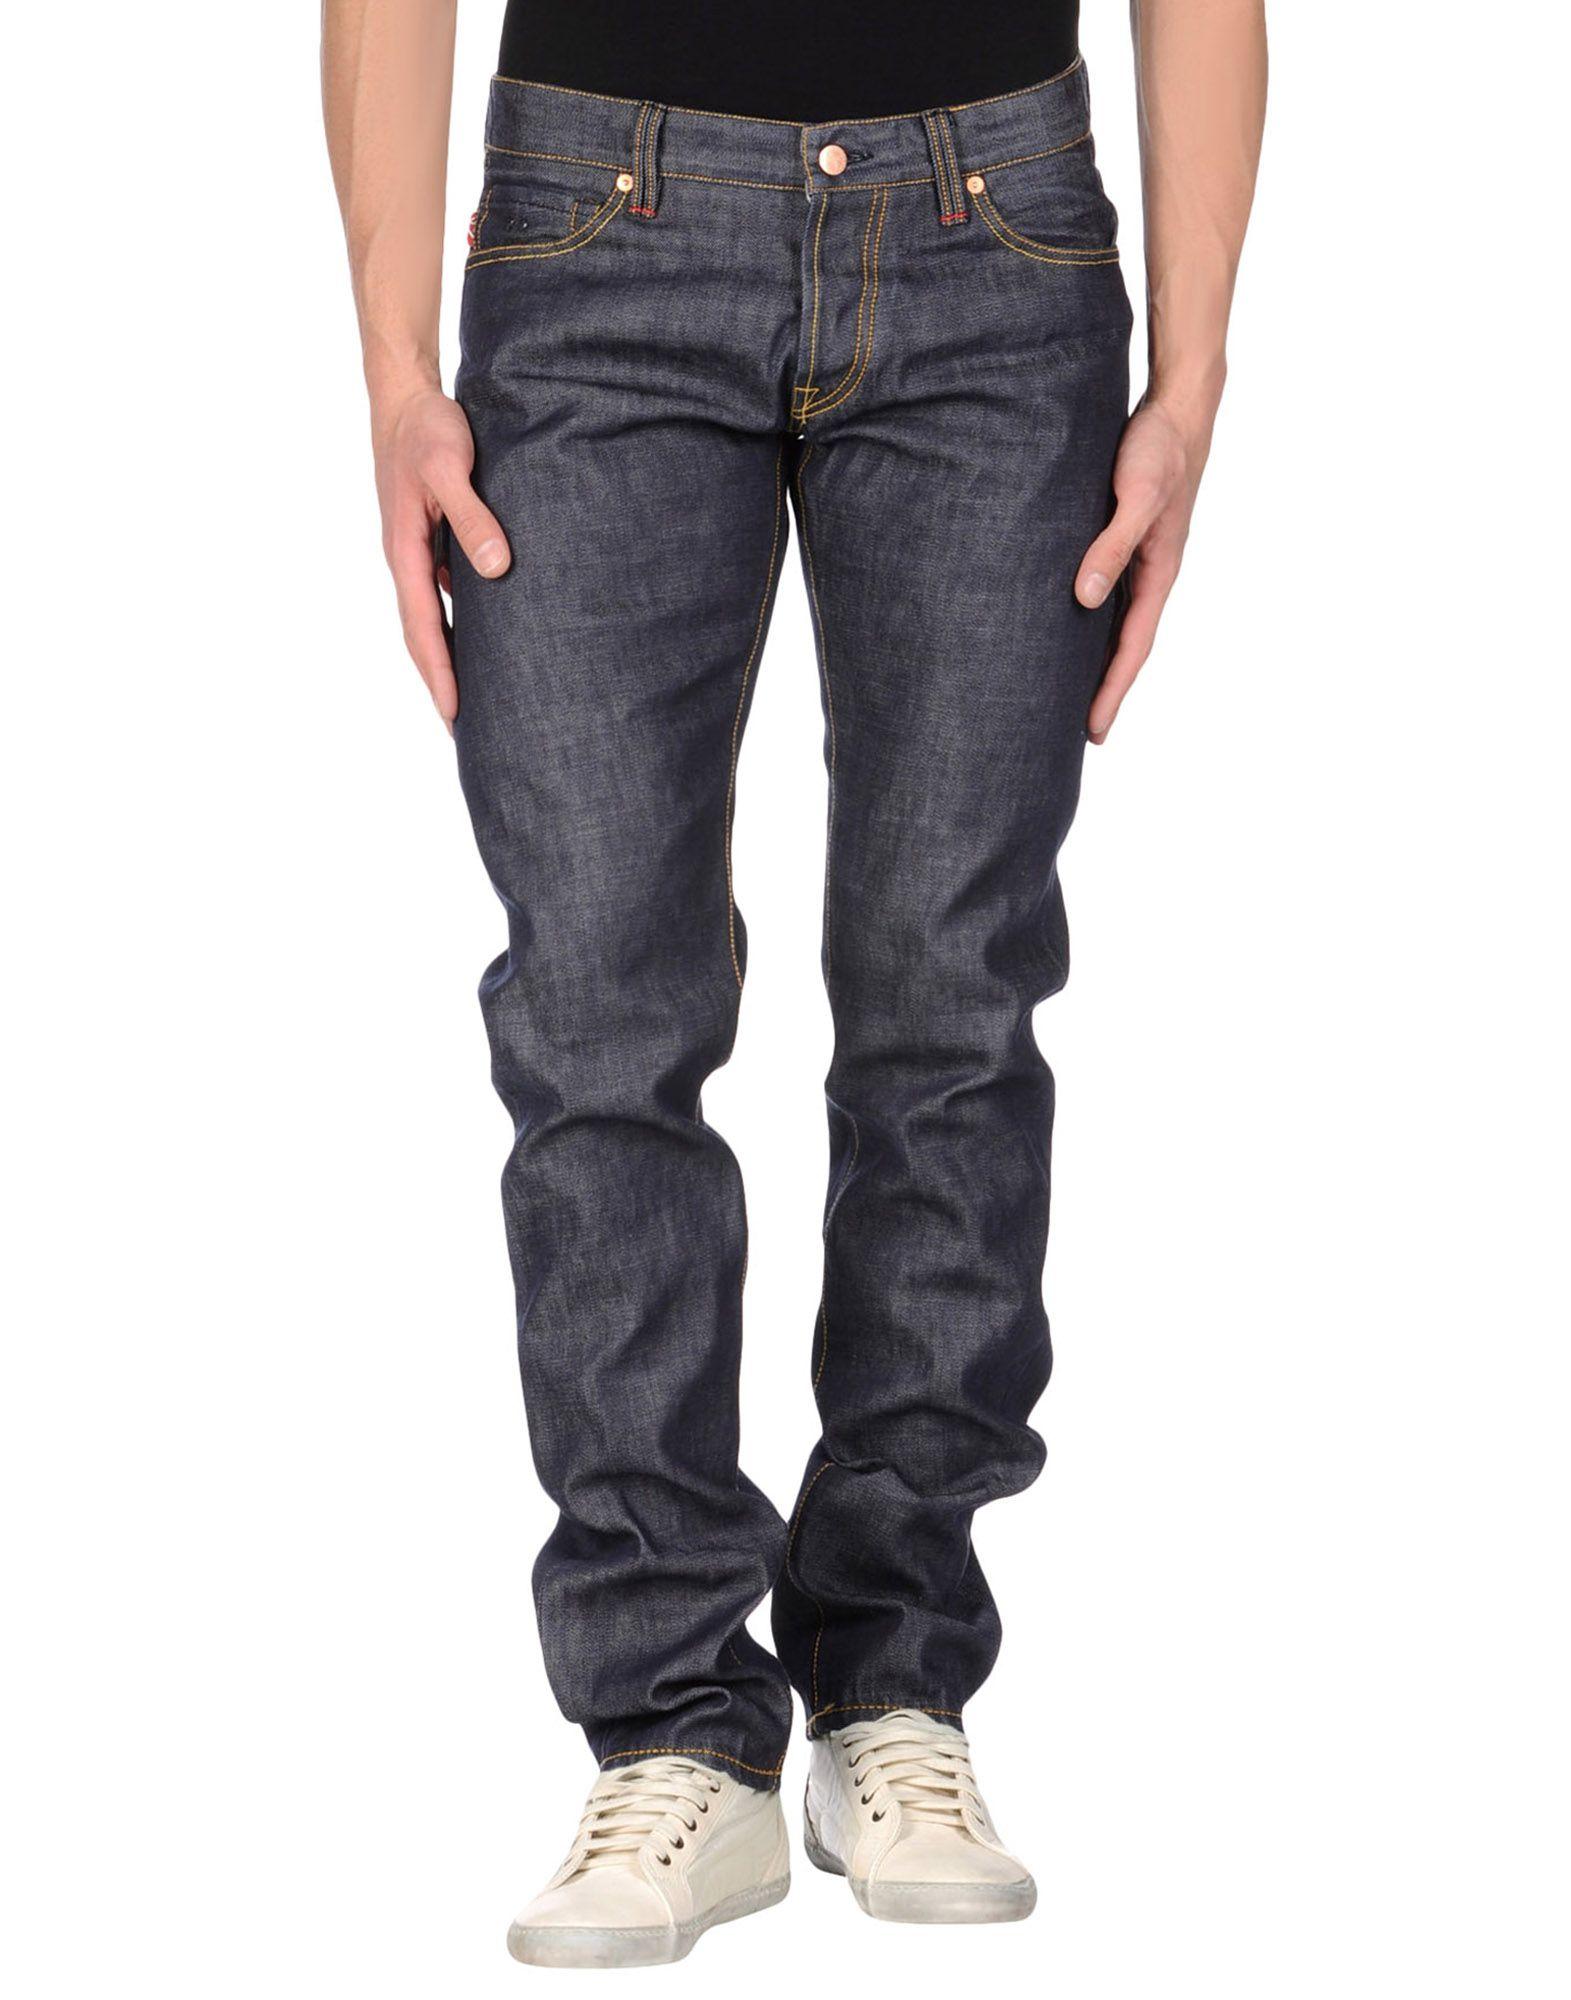 Pantaloni Jeans Tramarossa Uomo - Acquista online su